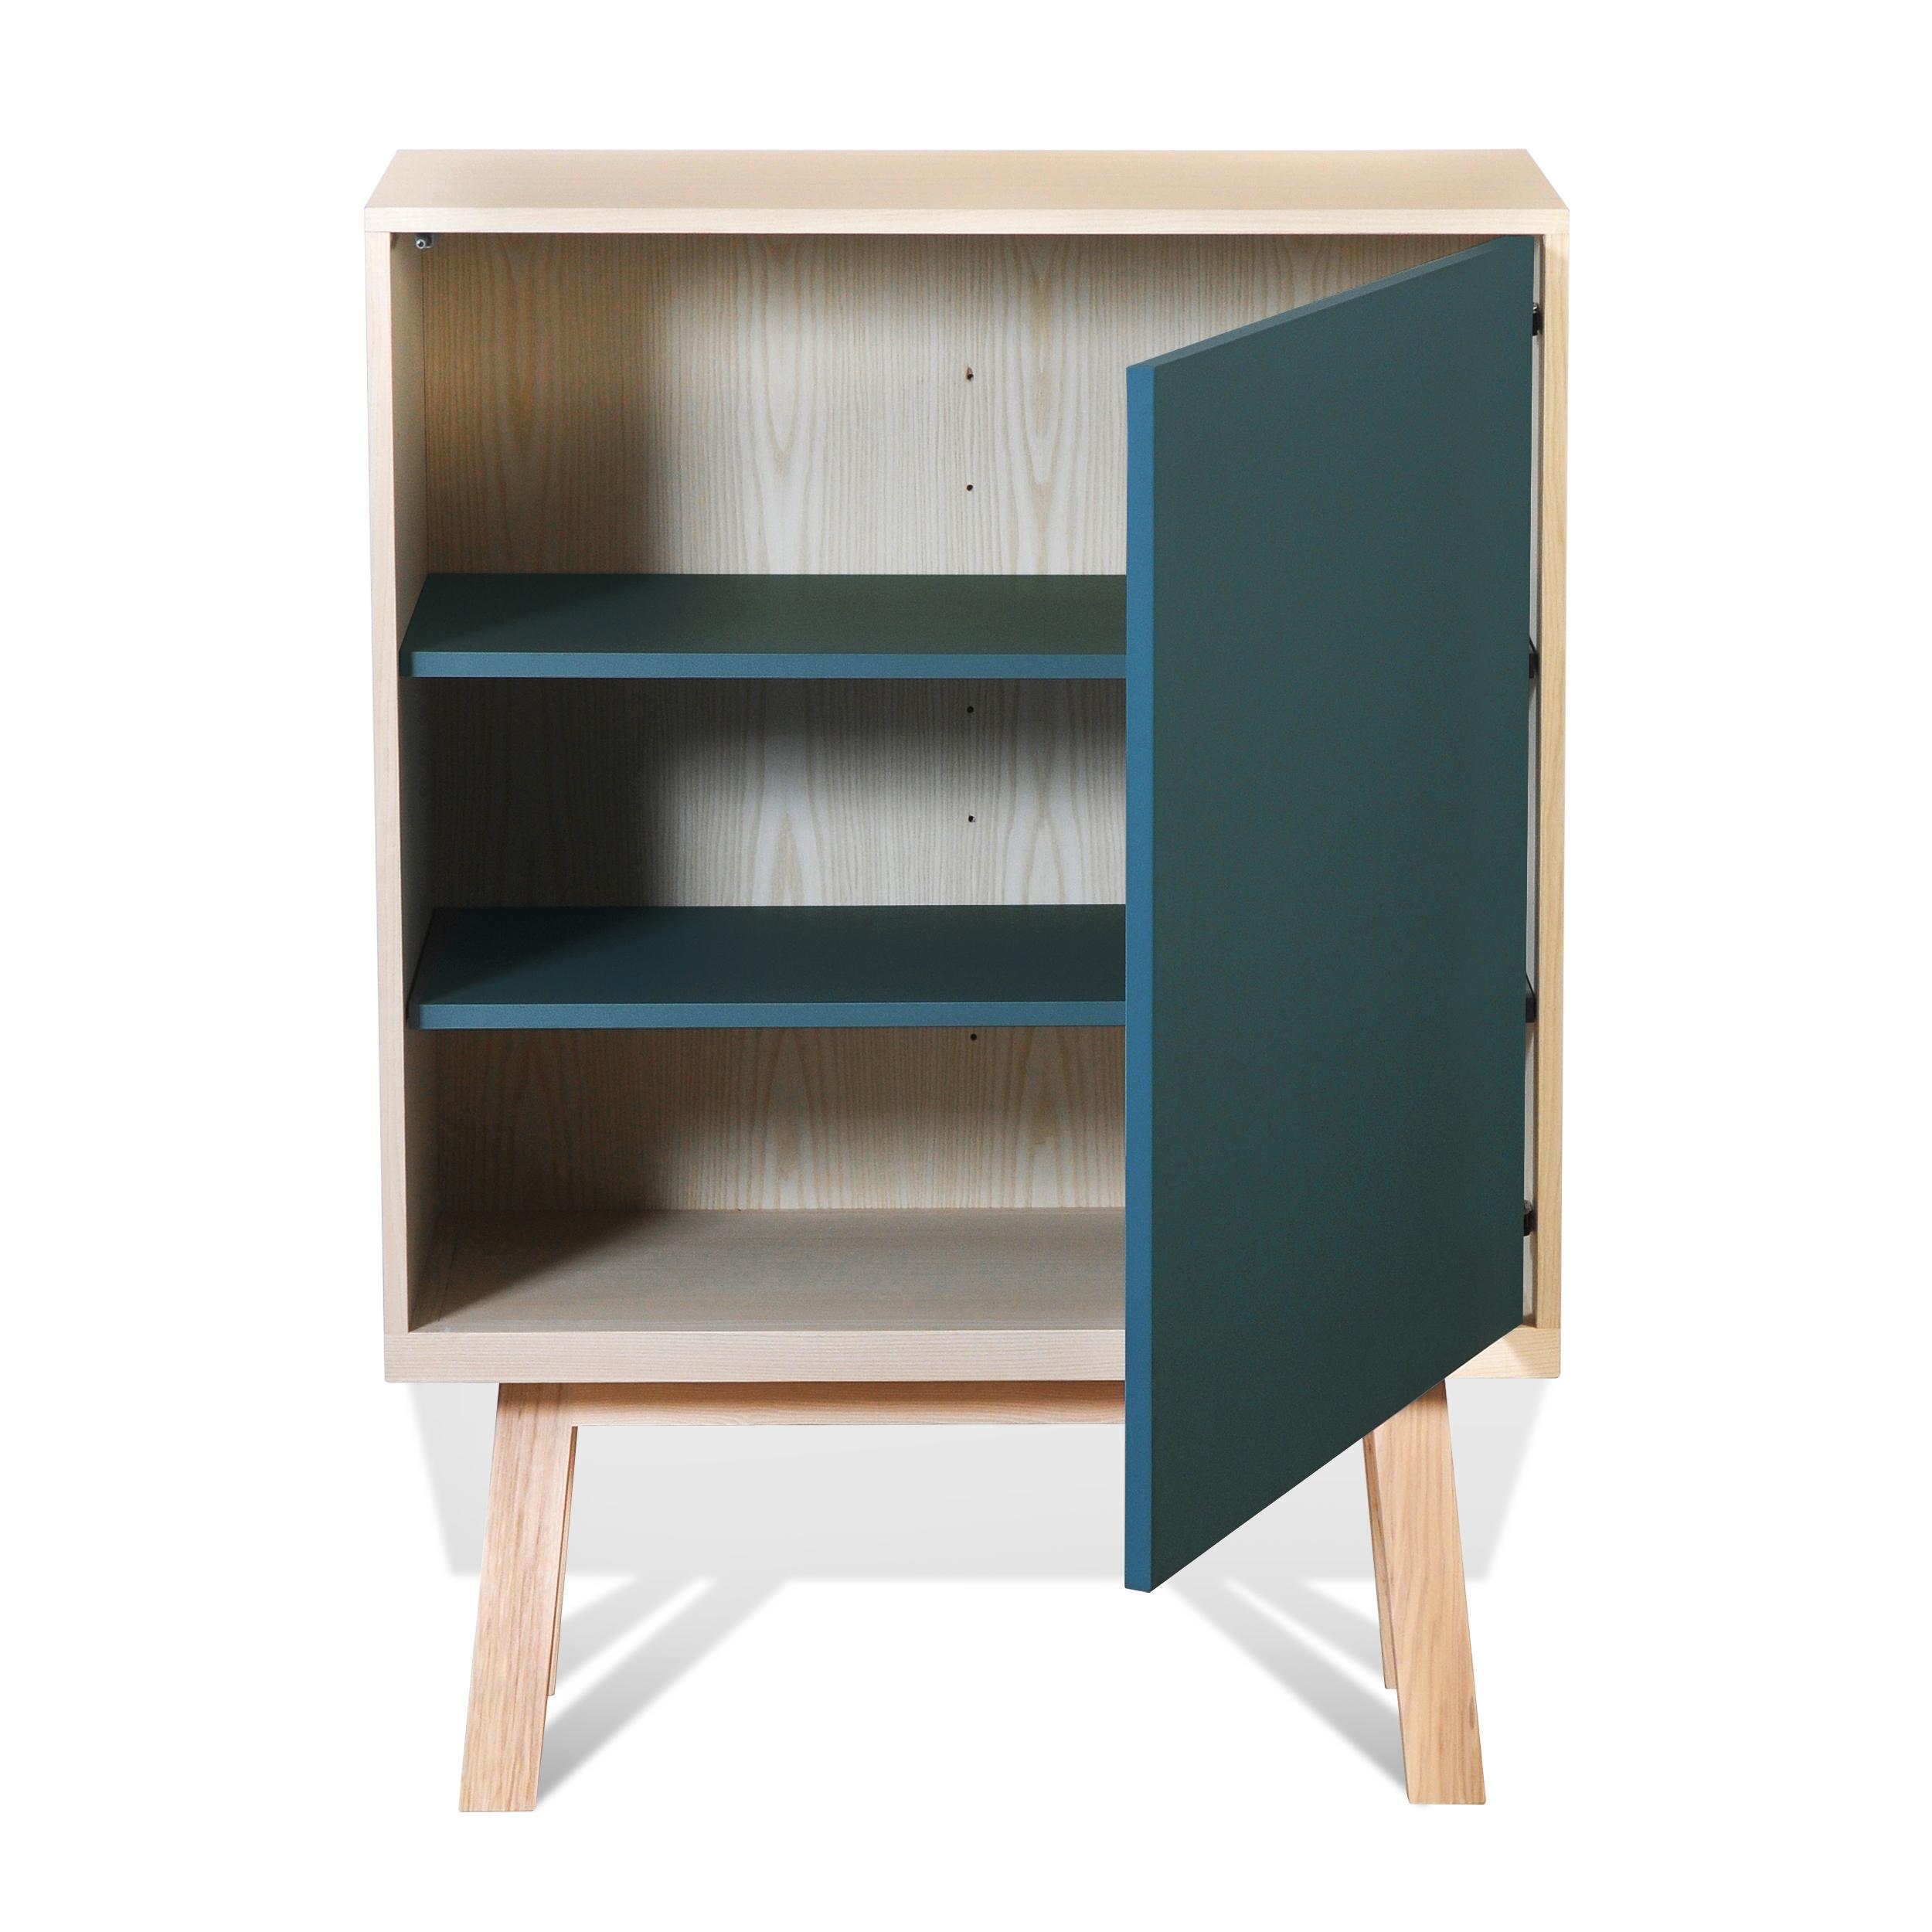 Armoire 1 porte en bois bleu frehel (photo)